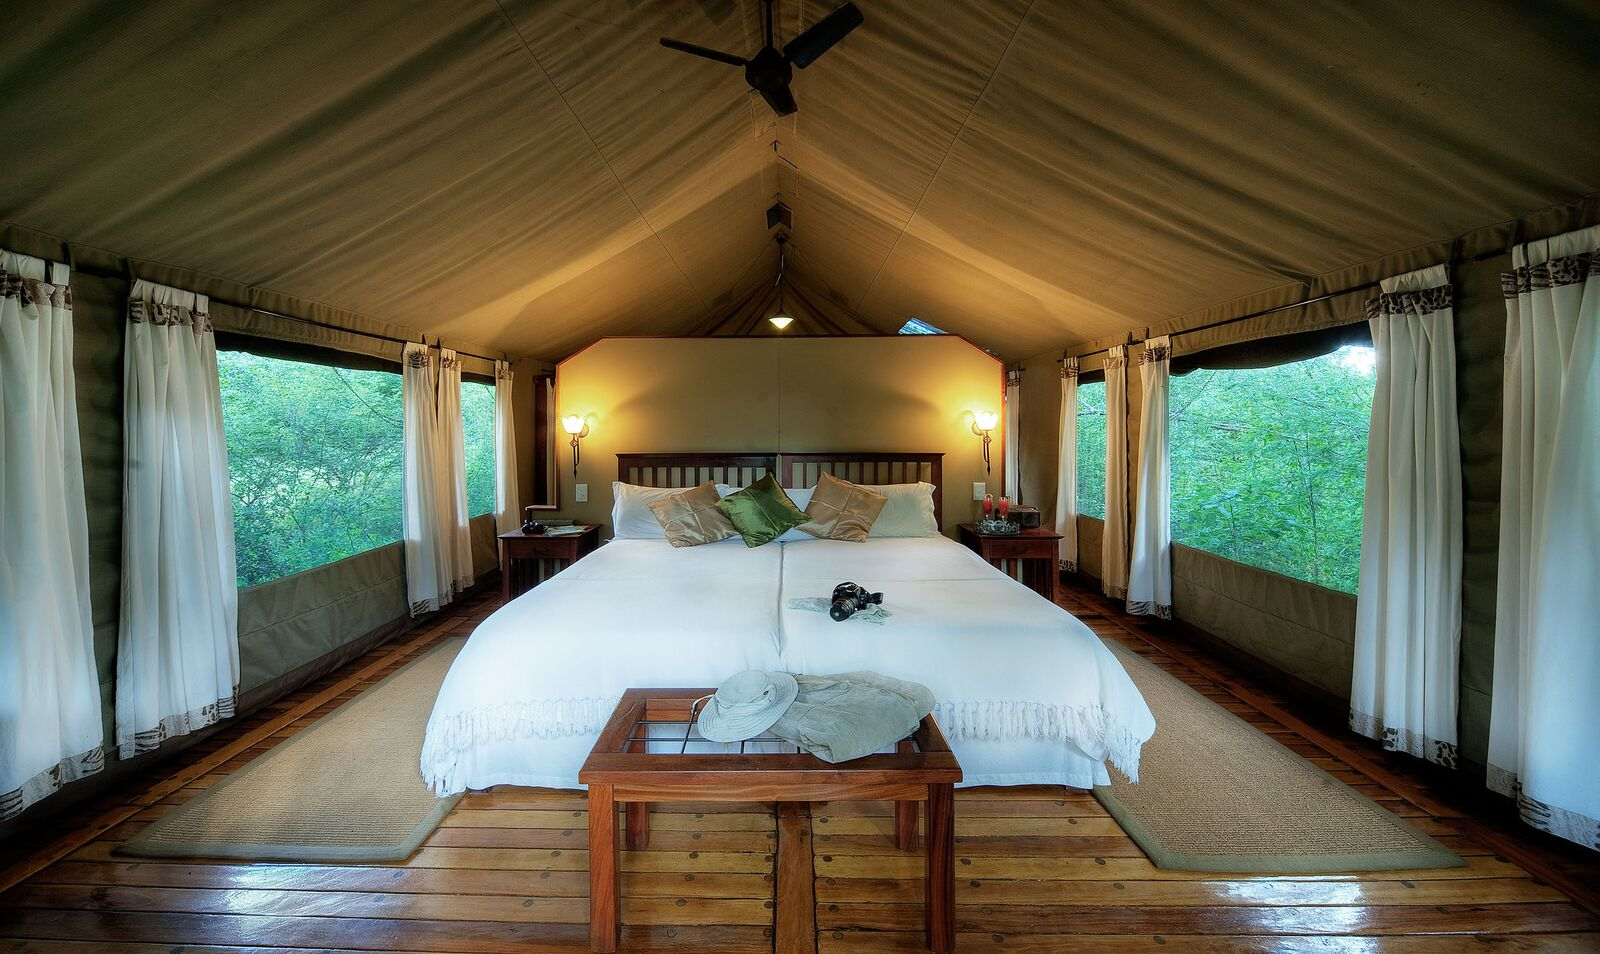 Luxe tent in kamp op safari in Afrika